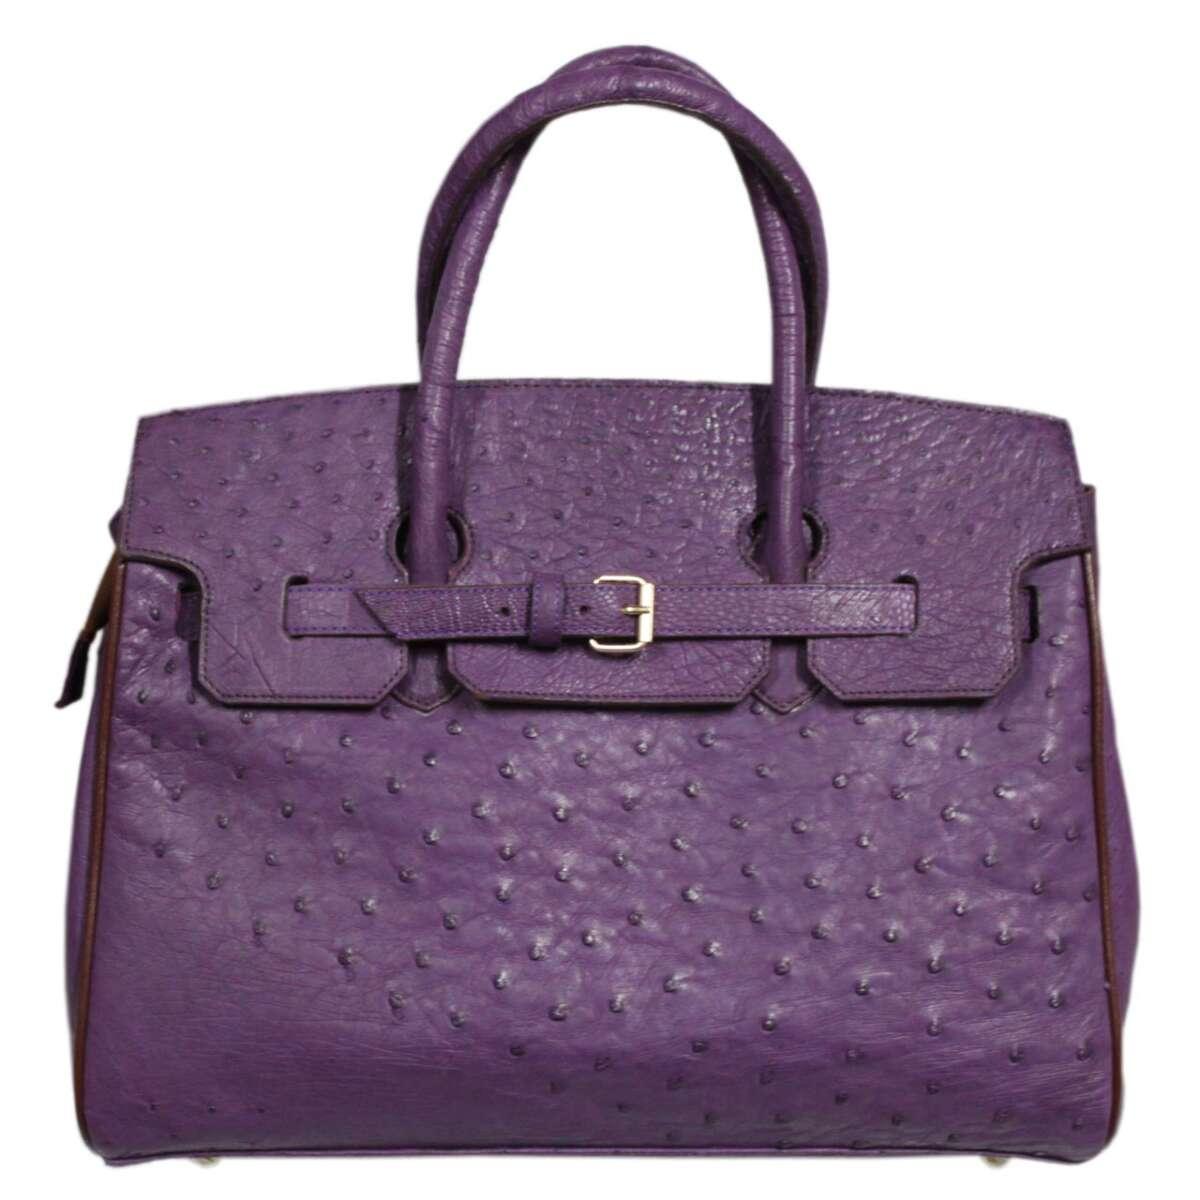 Túi xách nữ da đà điểu E006a